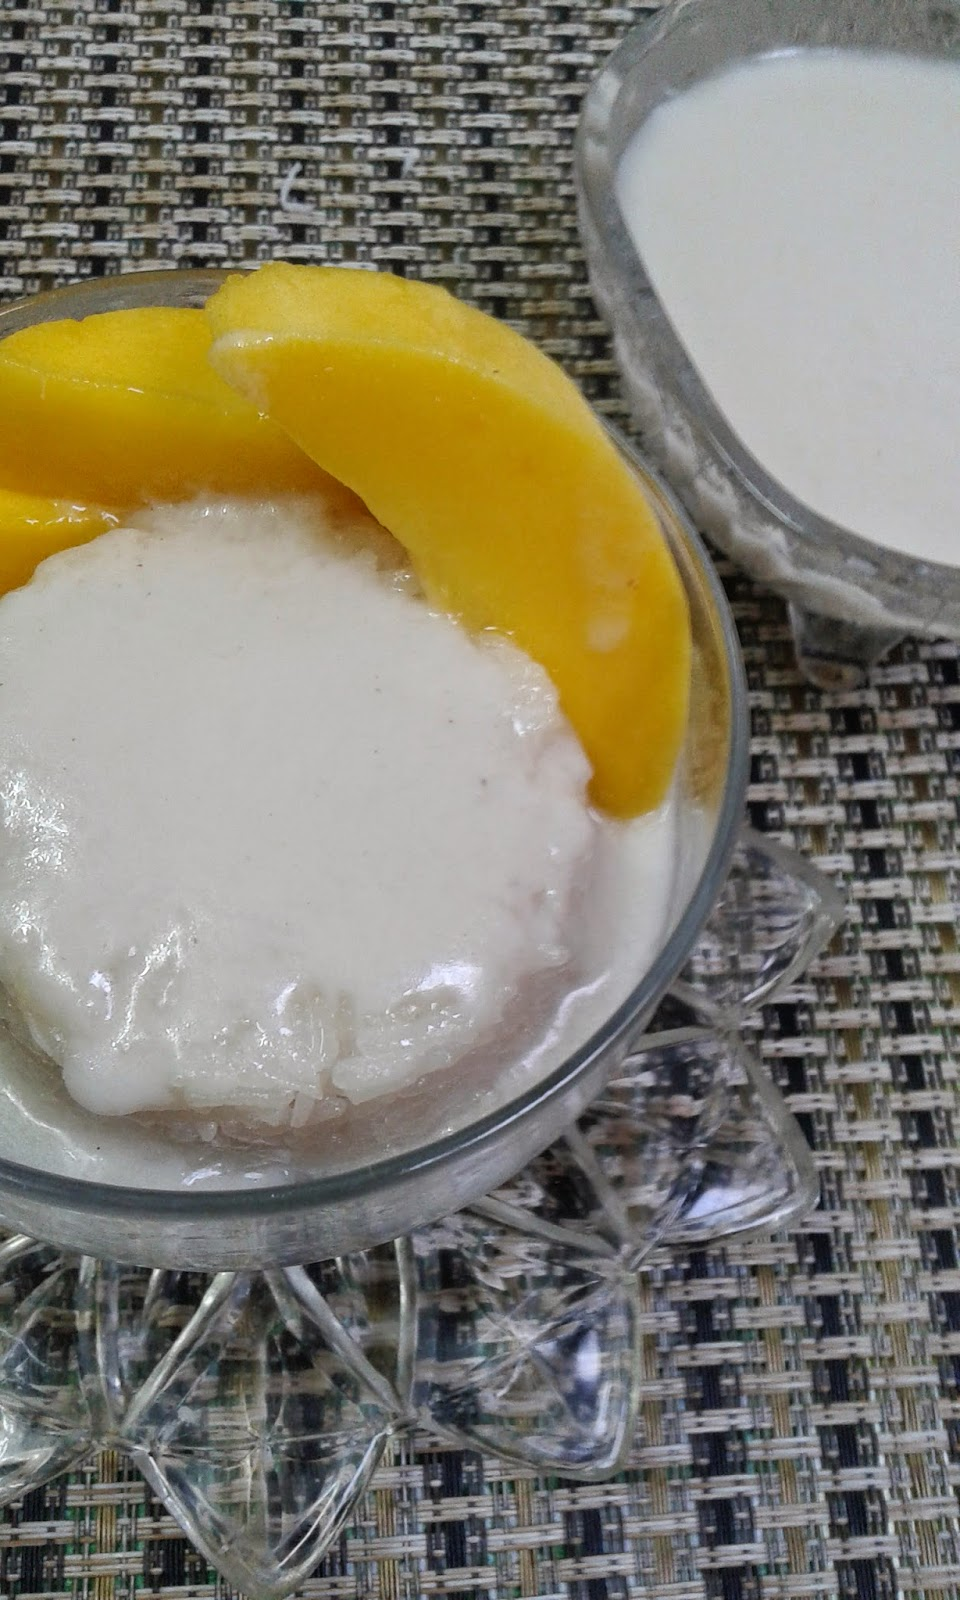 sambal mangga ikan masin zalekha luvs cooking pulut mangga  pulut kelapa  ikan Resepi Ikan Rebus Goreng Kelantan Enak dan Mudah